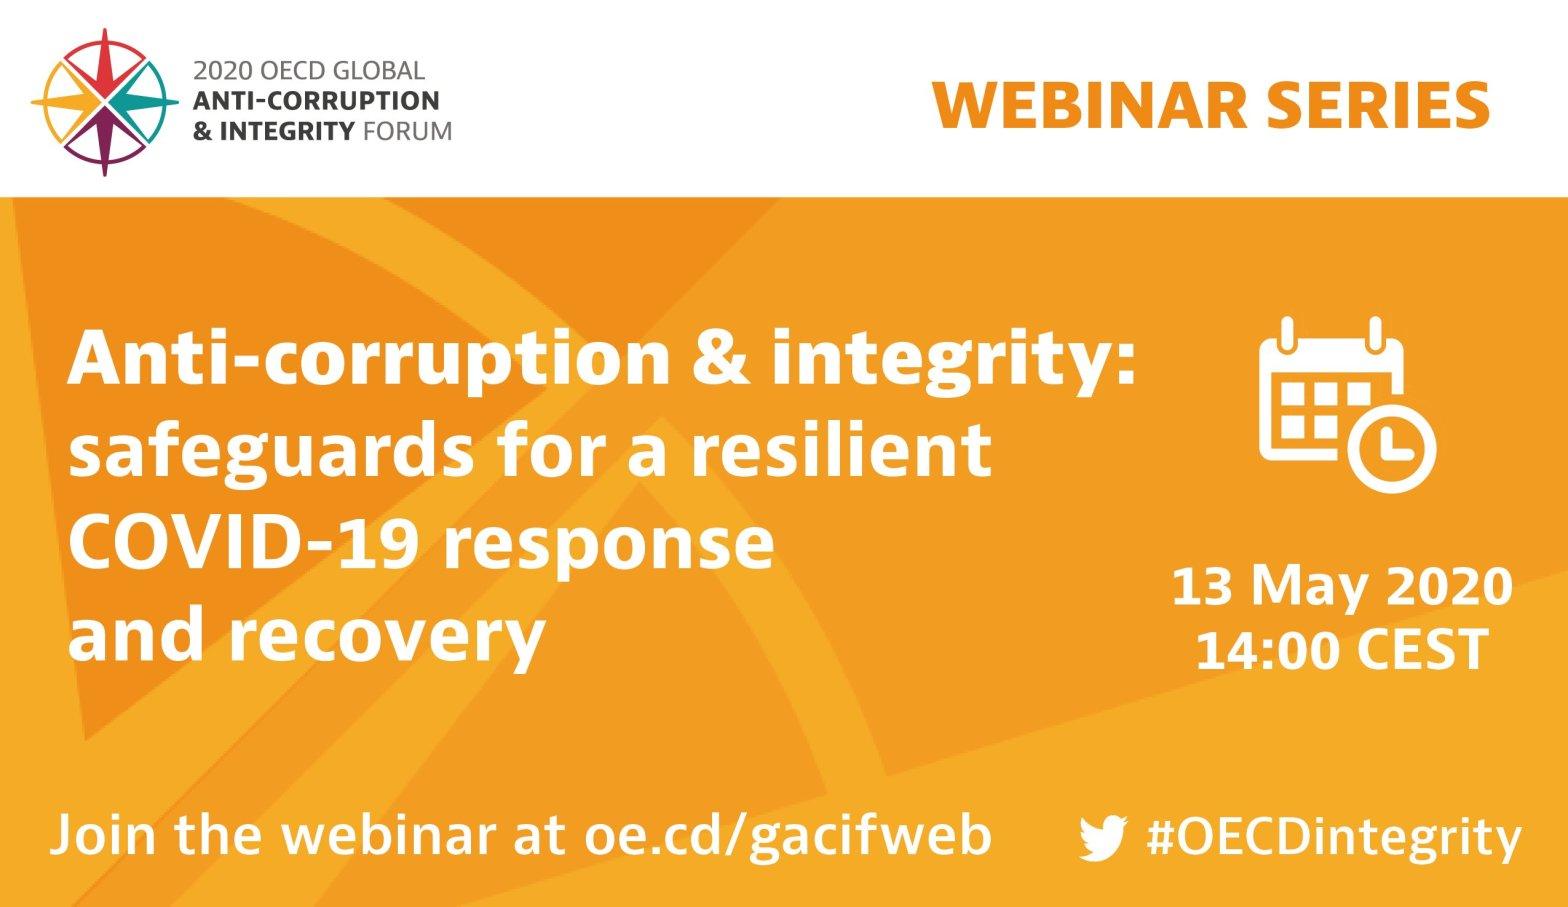 OECDintegrity-Webinar-Series.jpeg